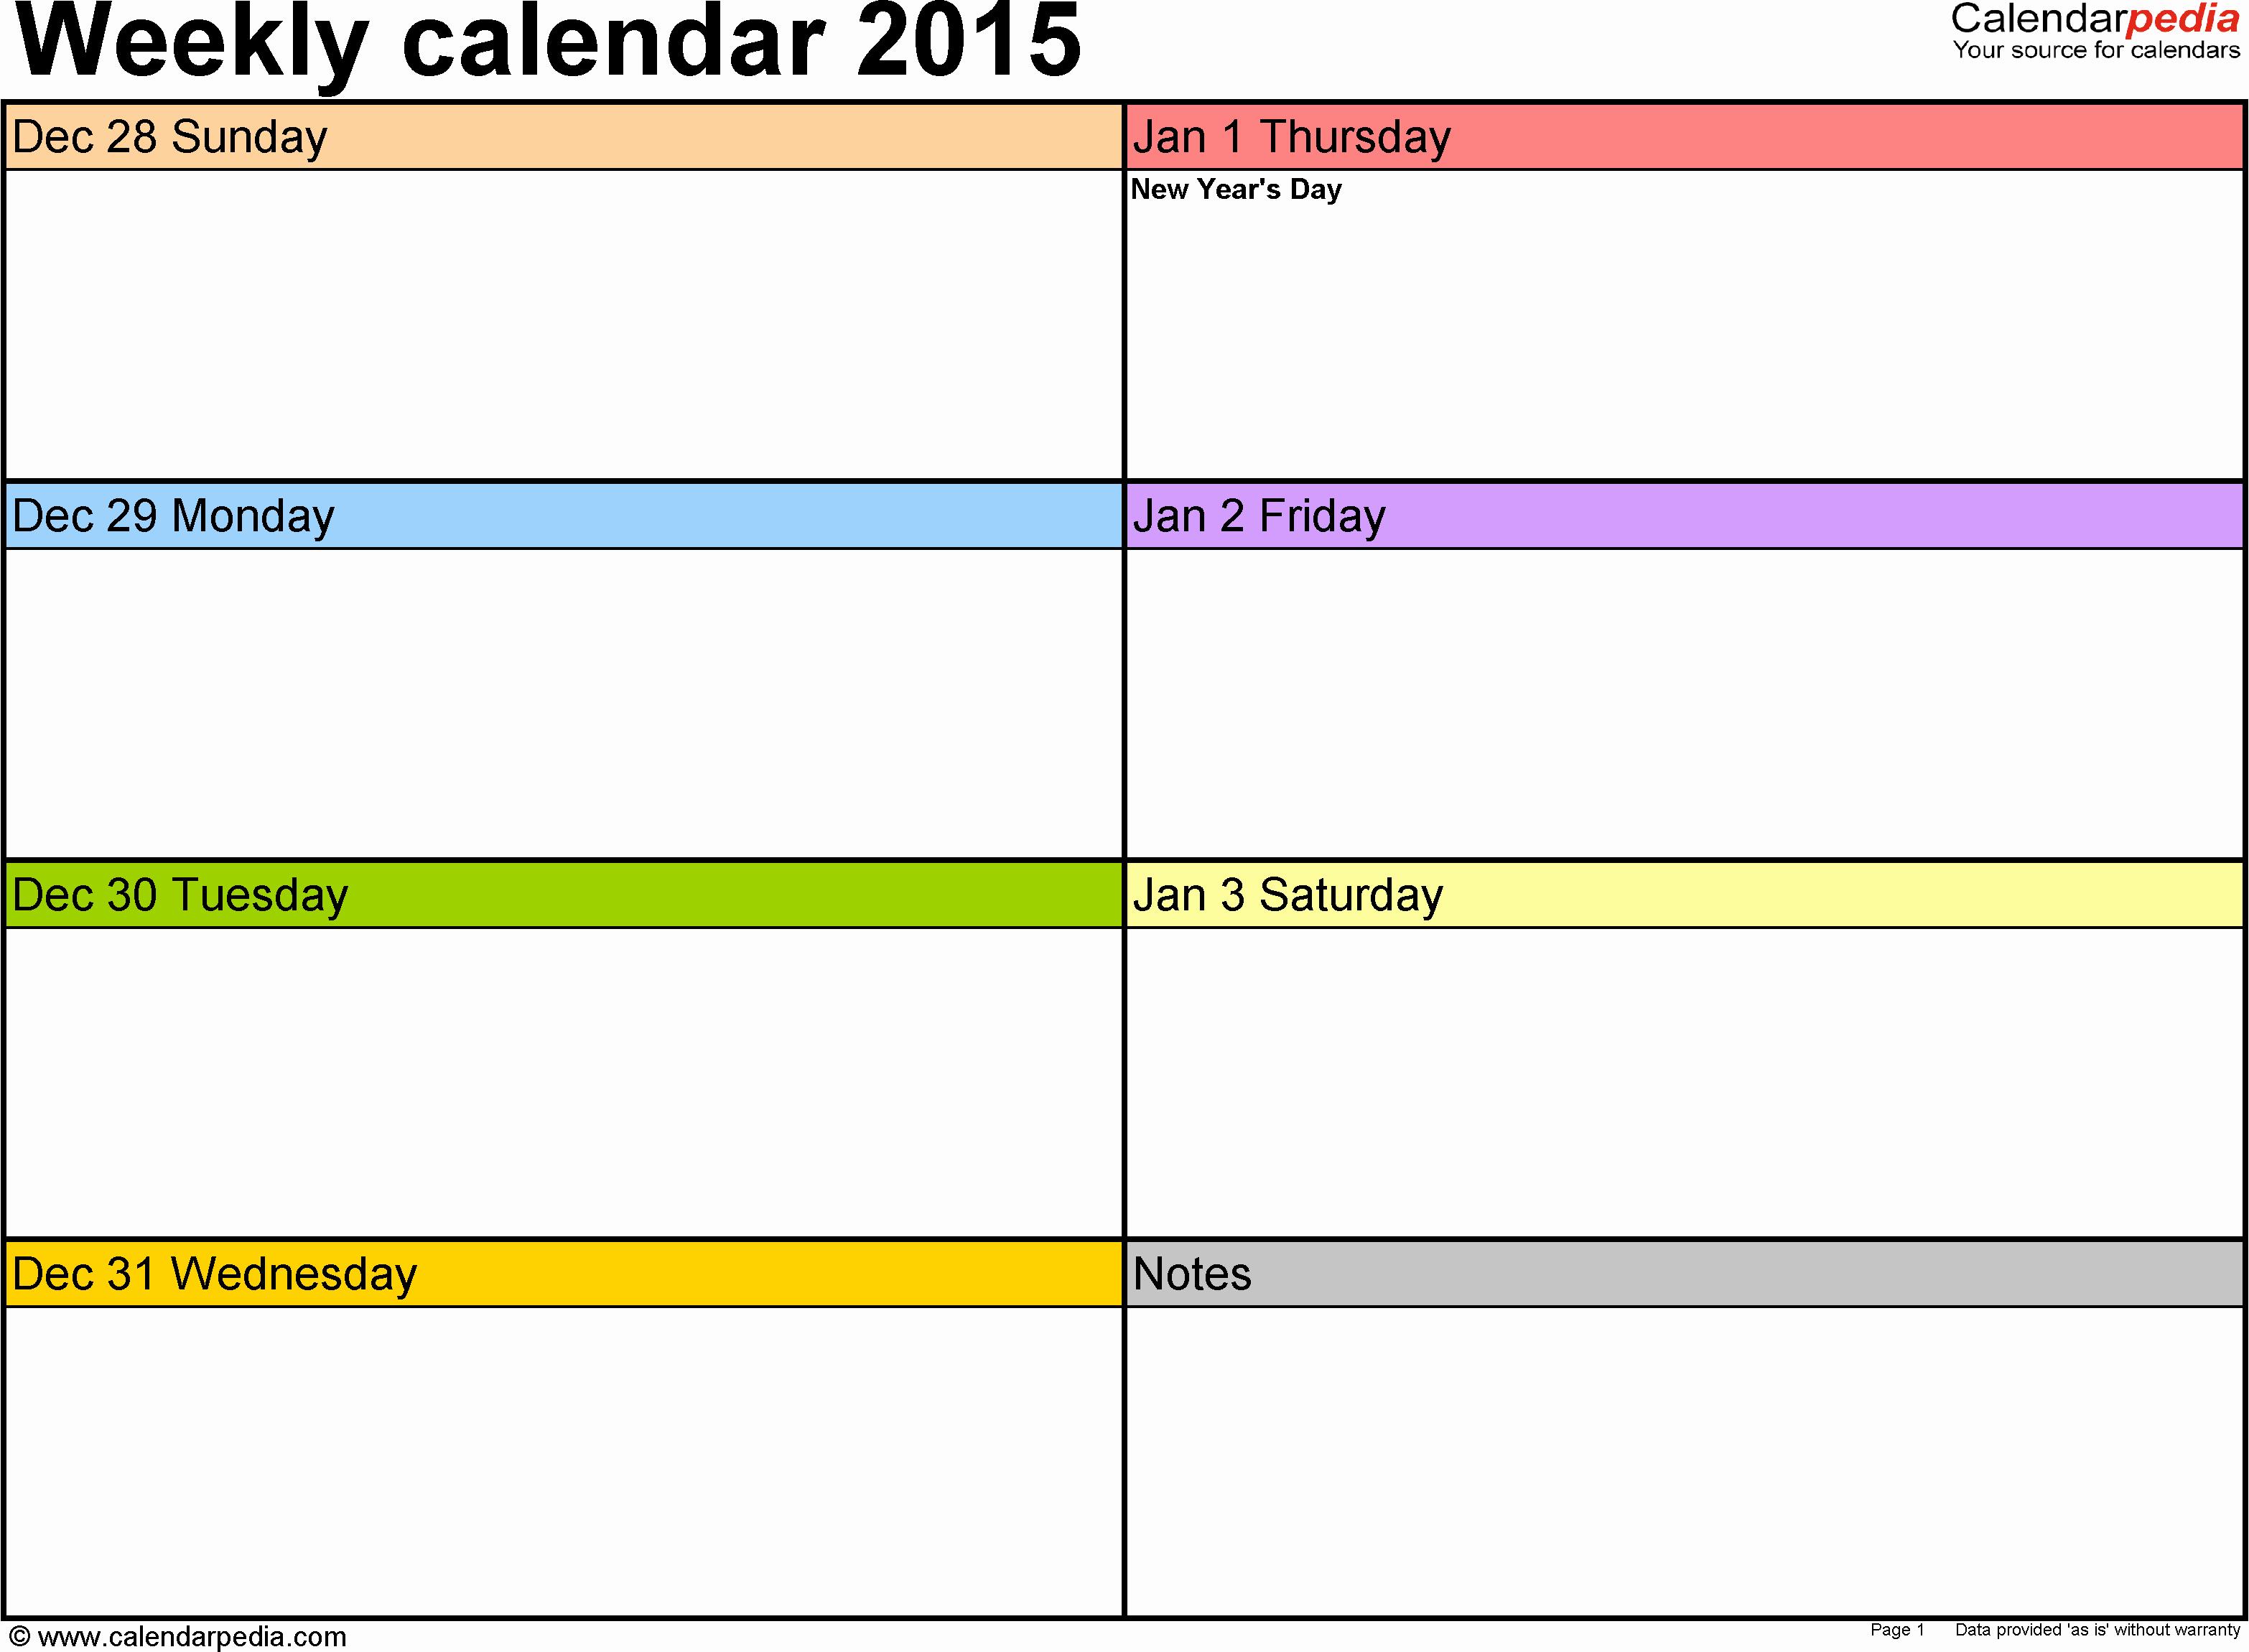 7 Day Week Calendar Template Best Of Weekly Calendar 2015 for Pdf 12 Free Printable Templates